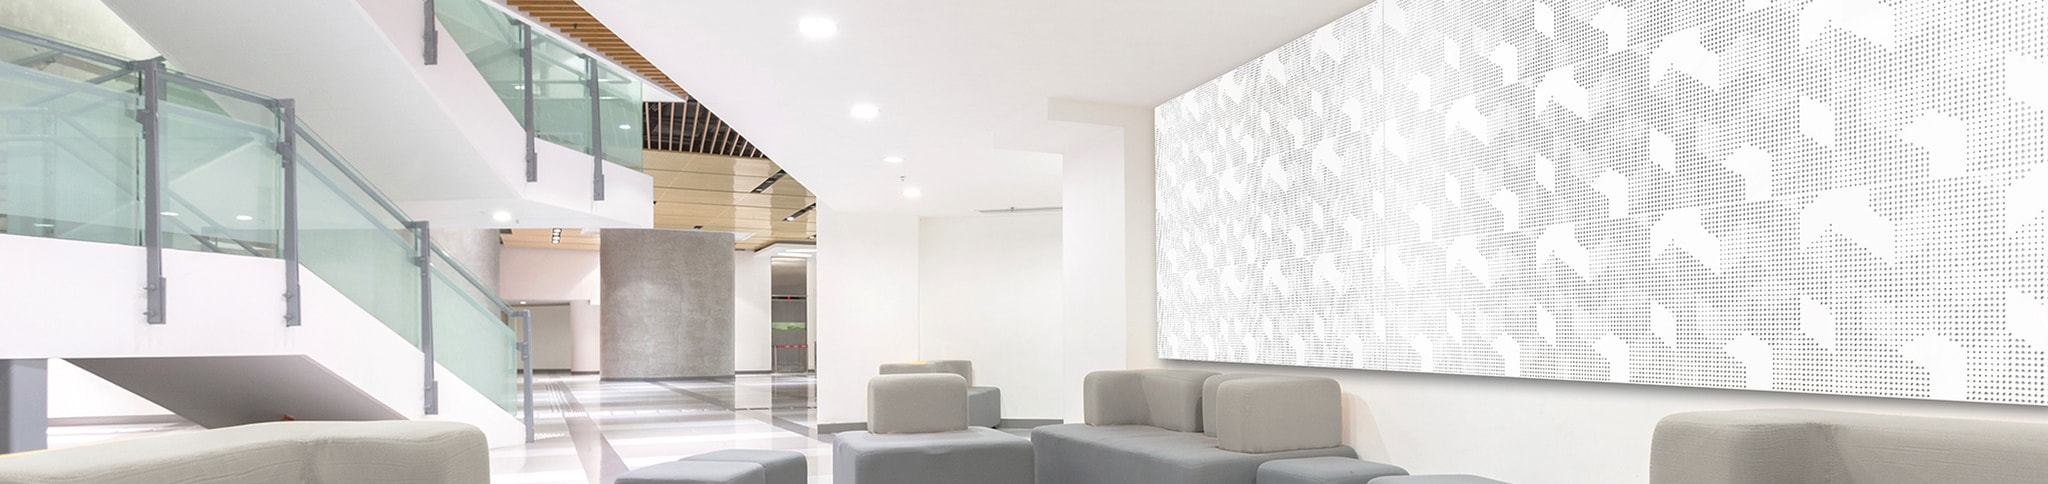 Artnovion White Office Acoustic Wall Panels